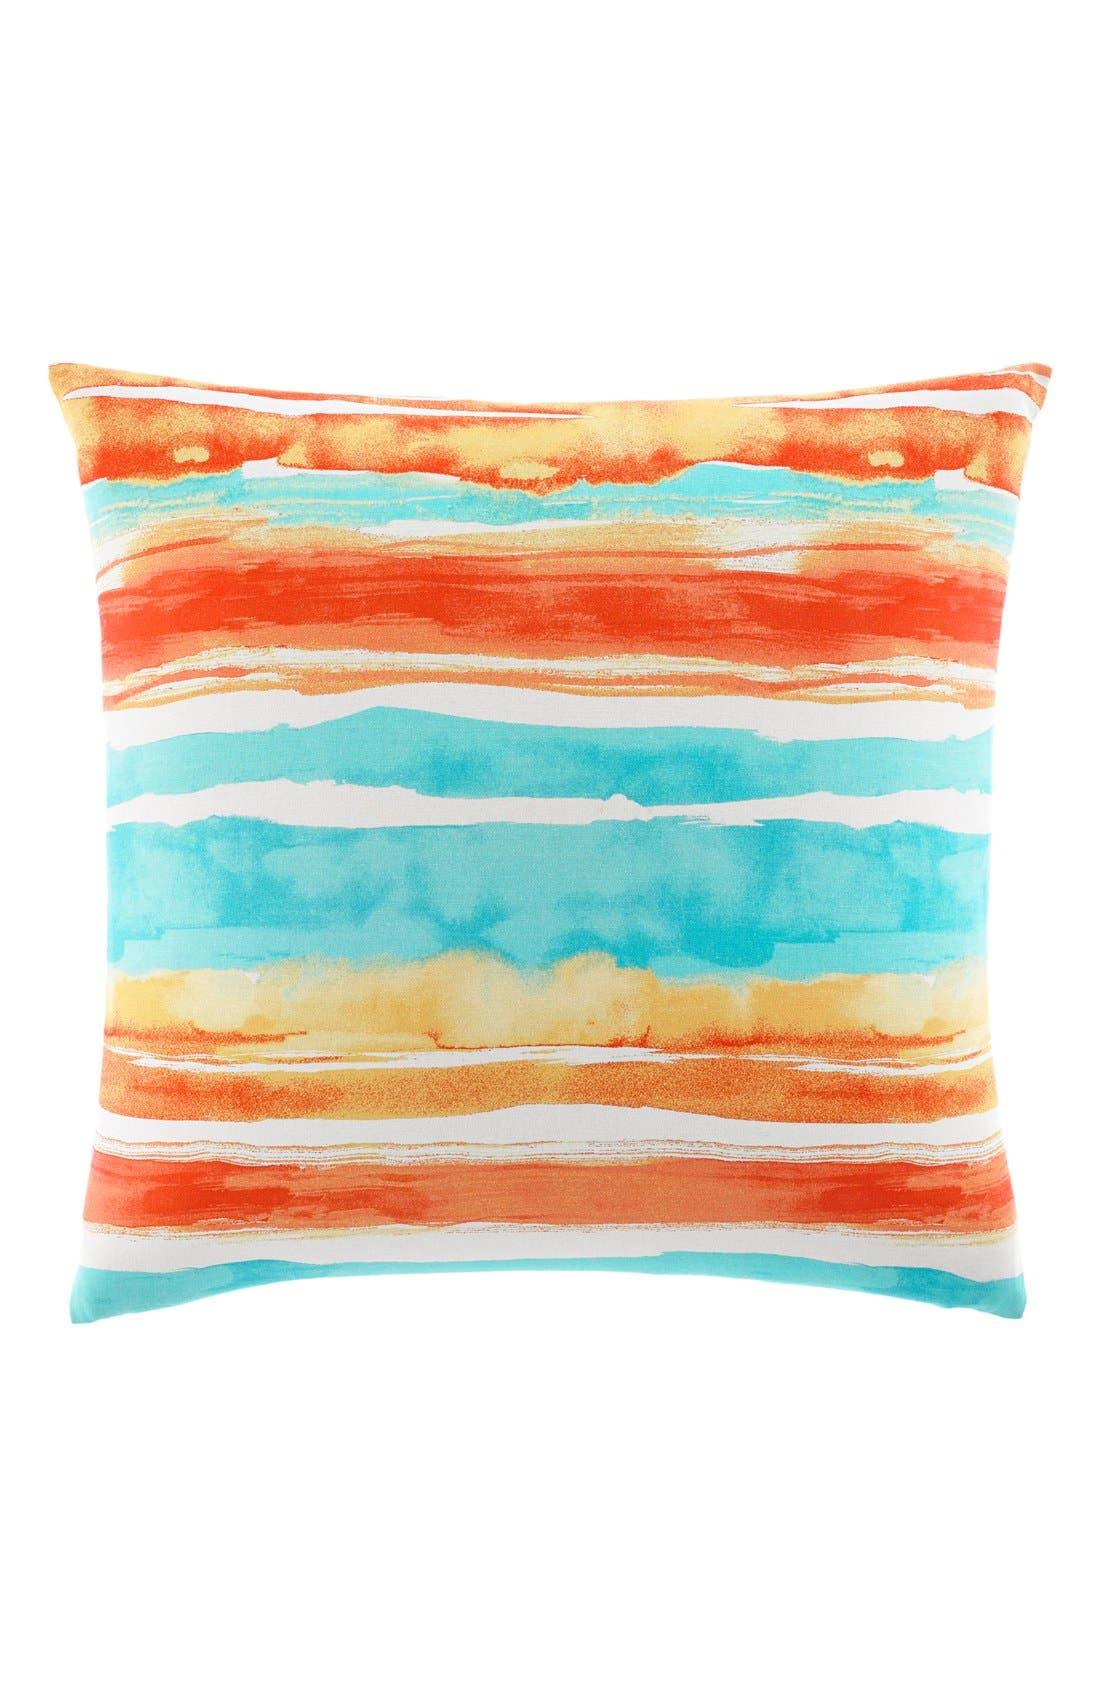 'Watercolor Stripe' Pillow,                             Main thumbnail 1, color,                             800